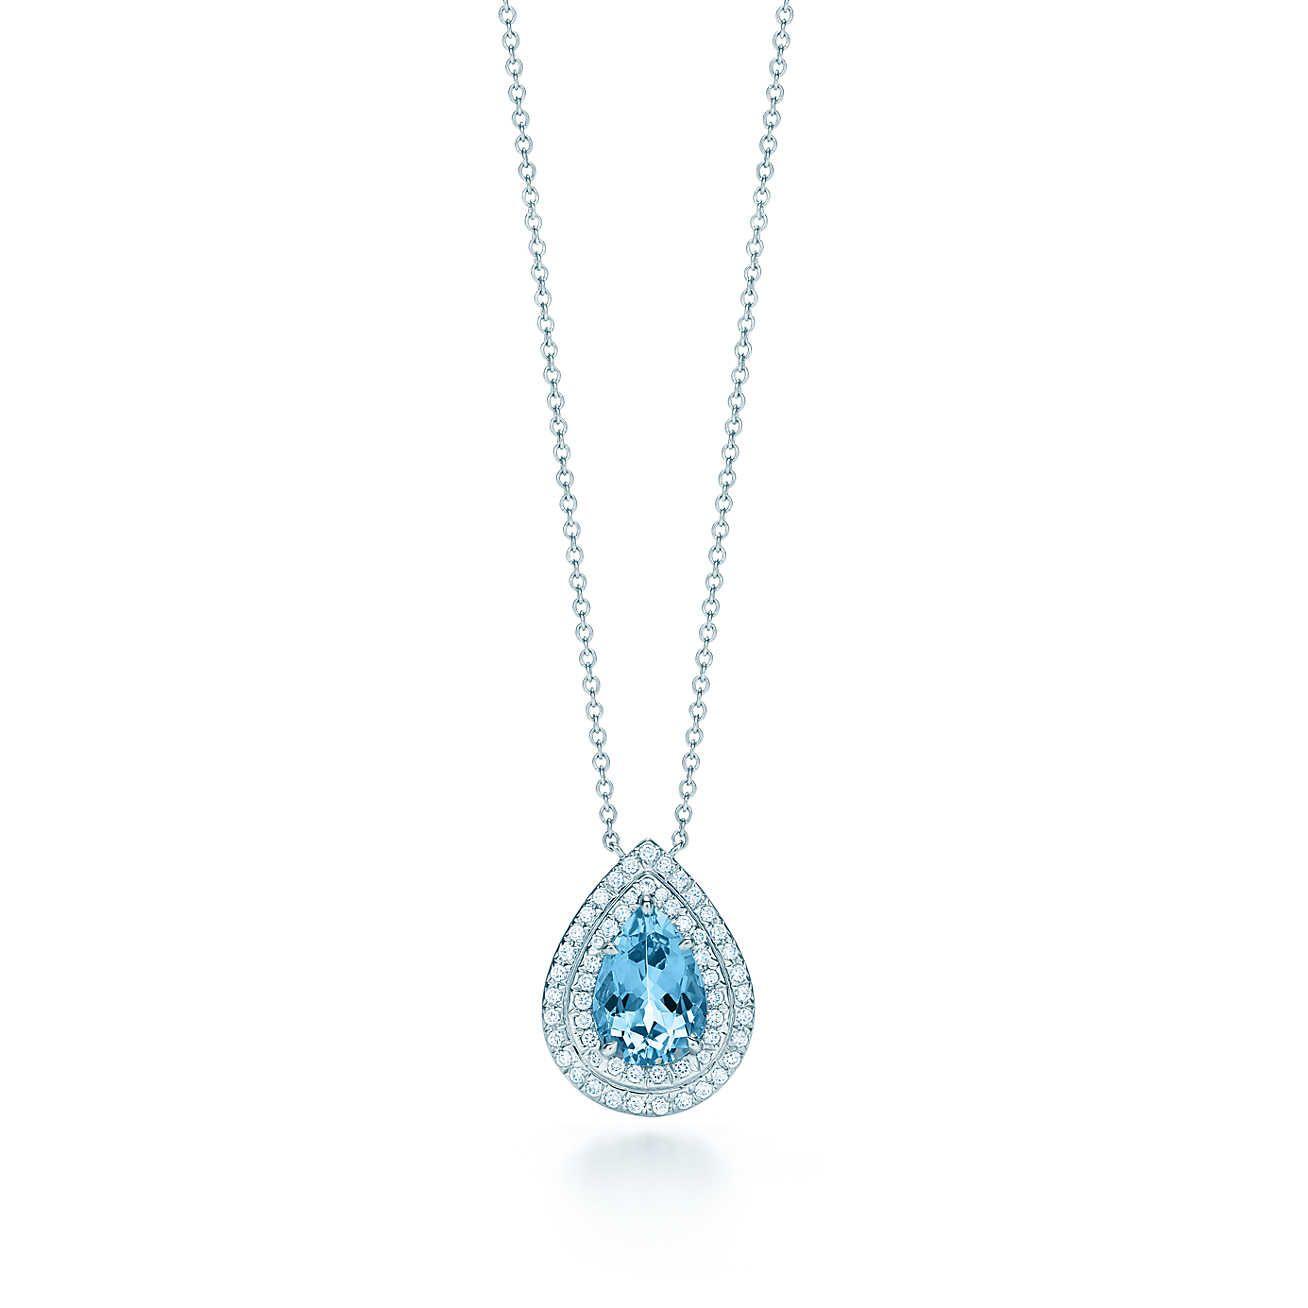 Tiffany soleste aquamarine and diamond pendant aquamarines tiffany soleste aquamarine and diamond pendant aloadofball Image collections